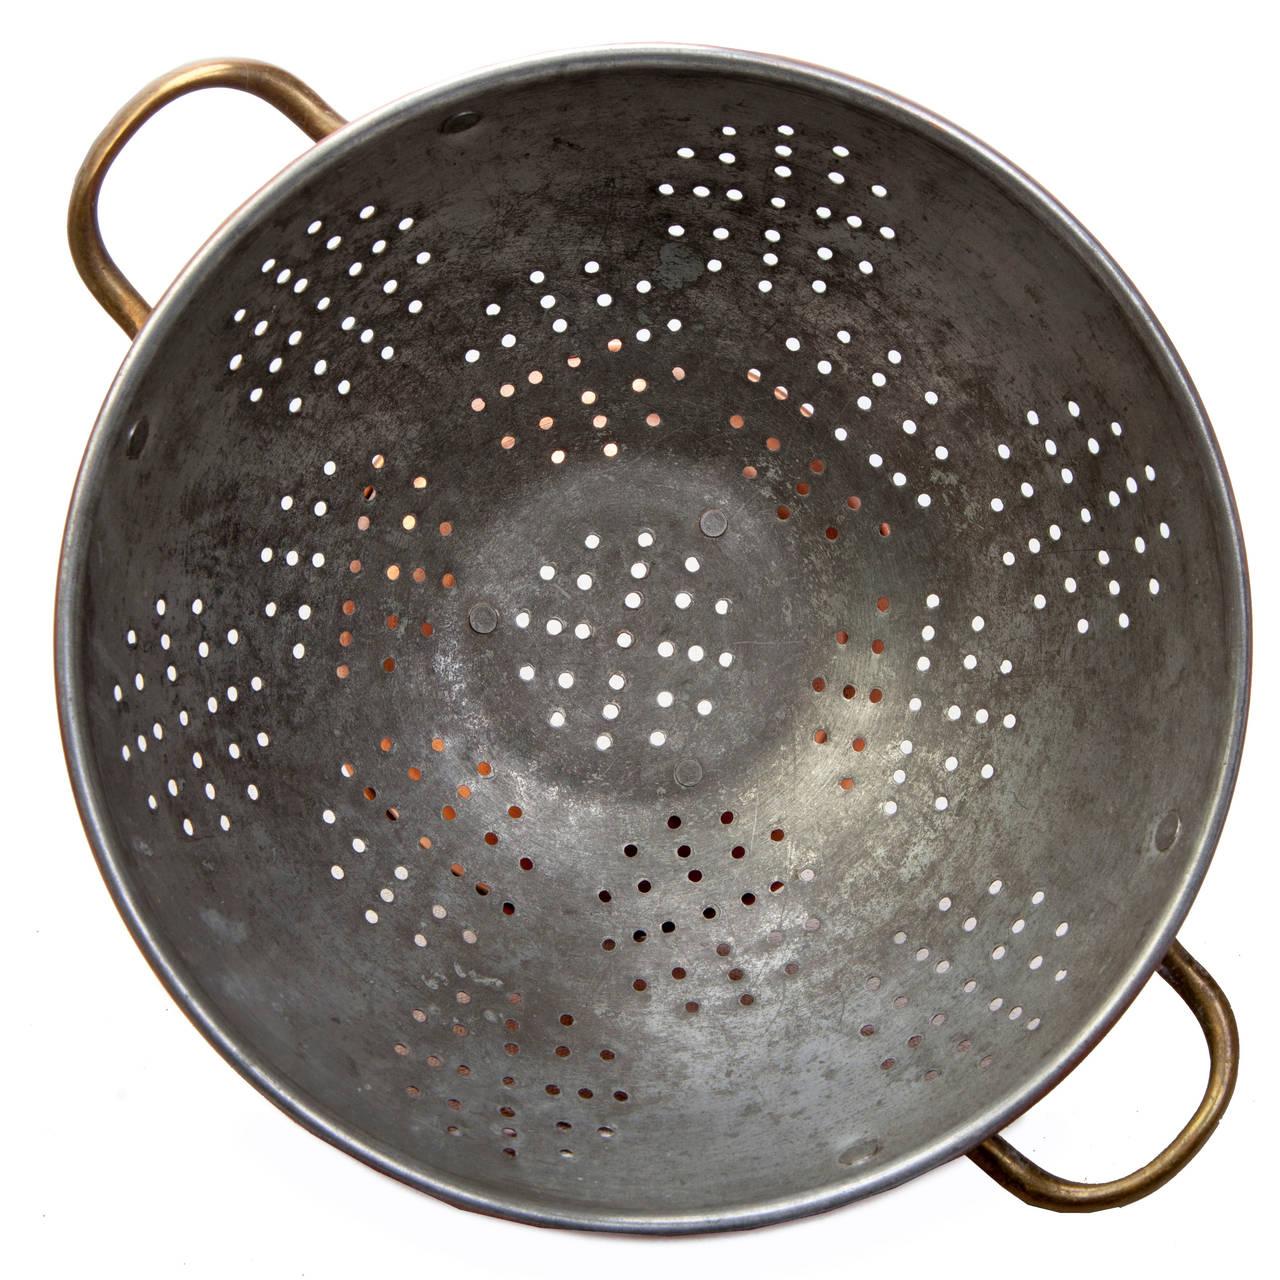 Waldow Brooklyn NY Copper Colander Strainer Vintage Kitchen Cookware Mid Century Metals